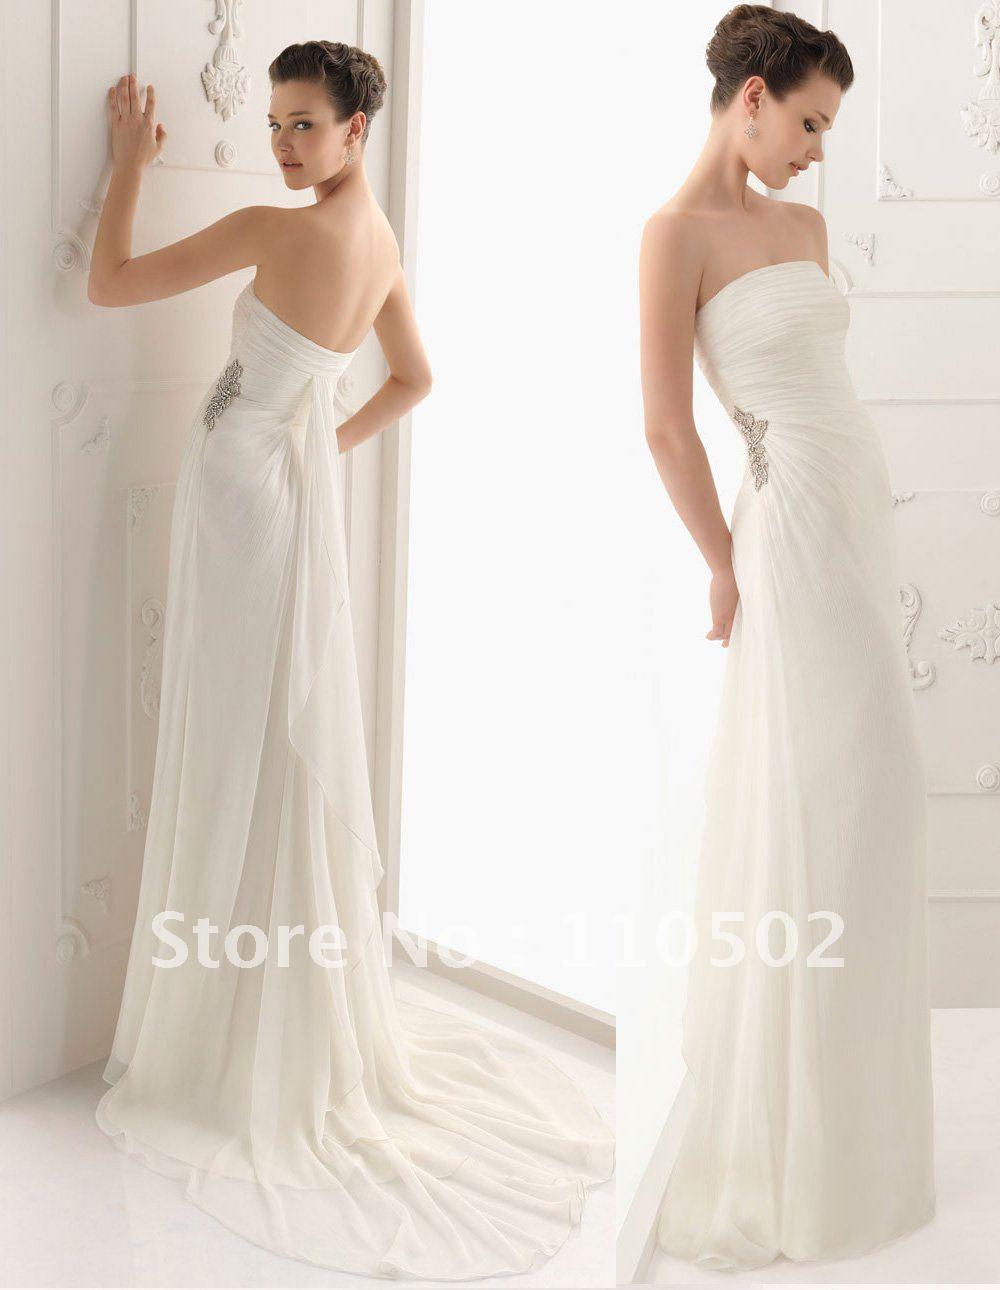 Free Shipping Cost Pleated Strapless Chiffon Beaded Informal Cheap Beach Wedding Dresses